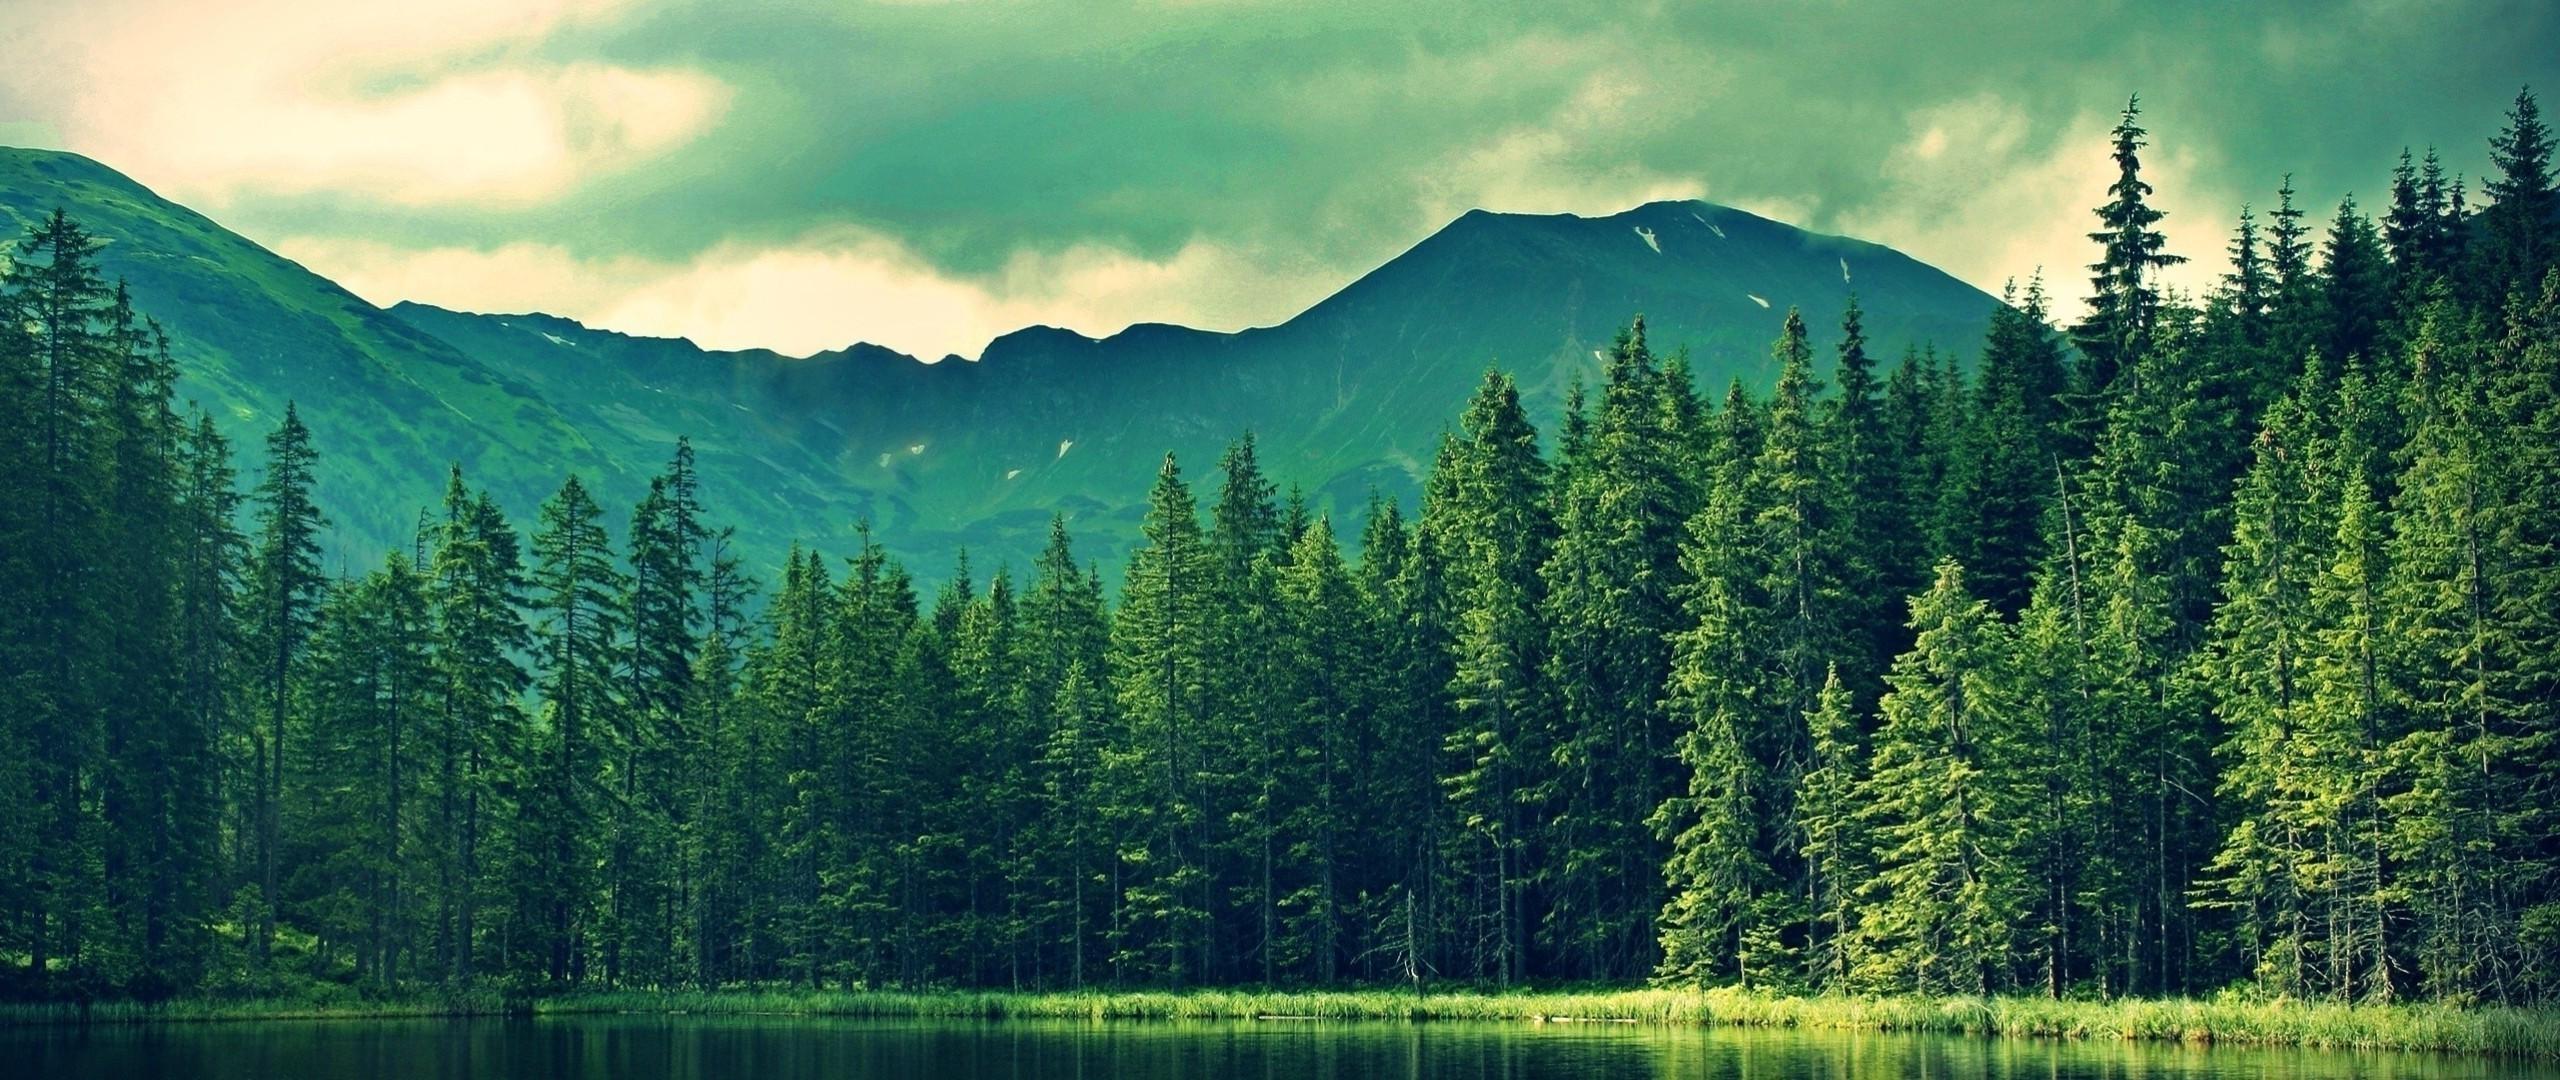 Res: 2560x1080,  Hintergrundbilder : Landschaft, Wald, See, Natur, Betrachtung,  Grün, Morgen